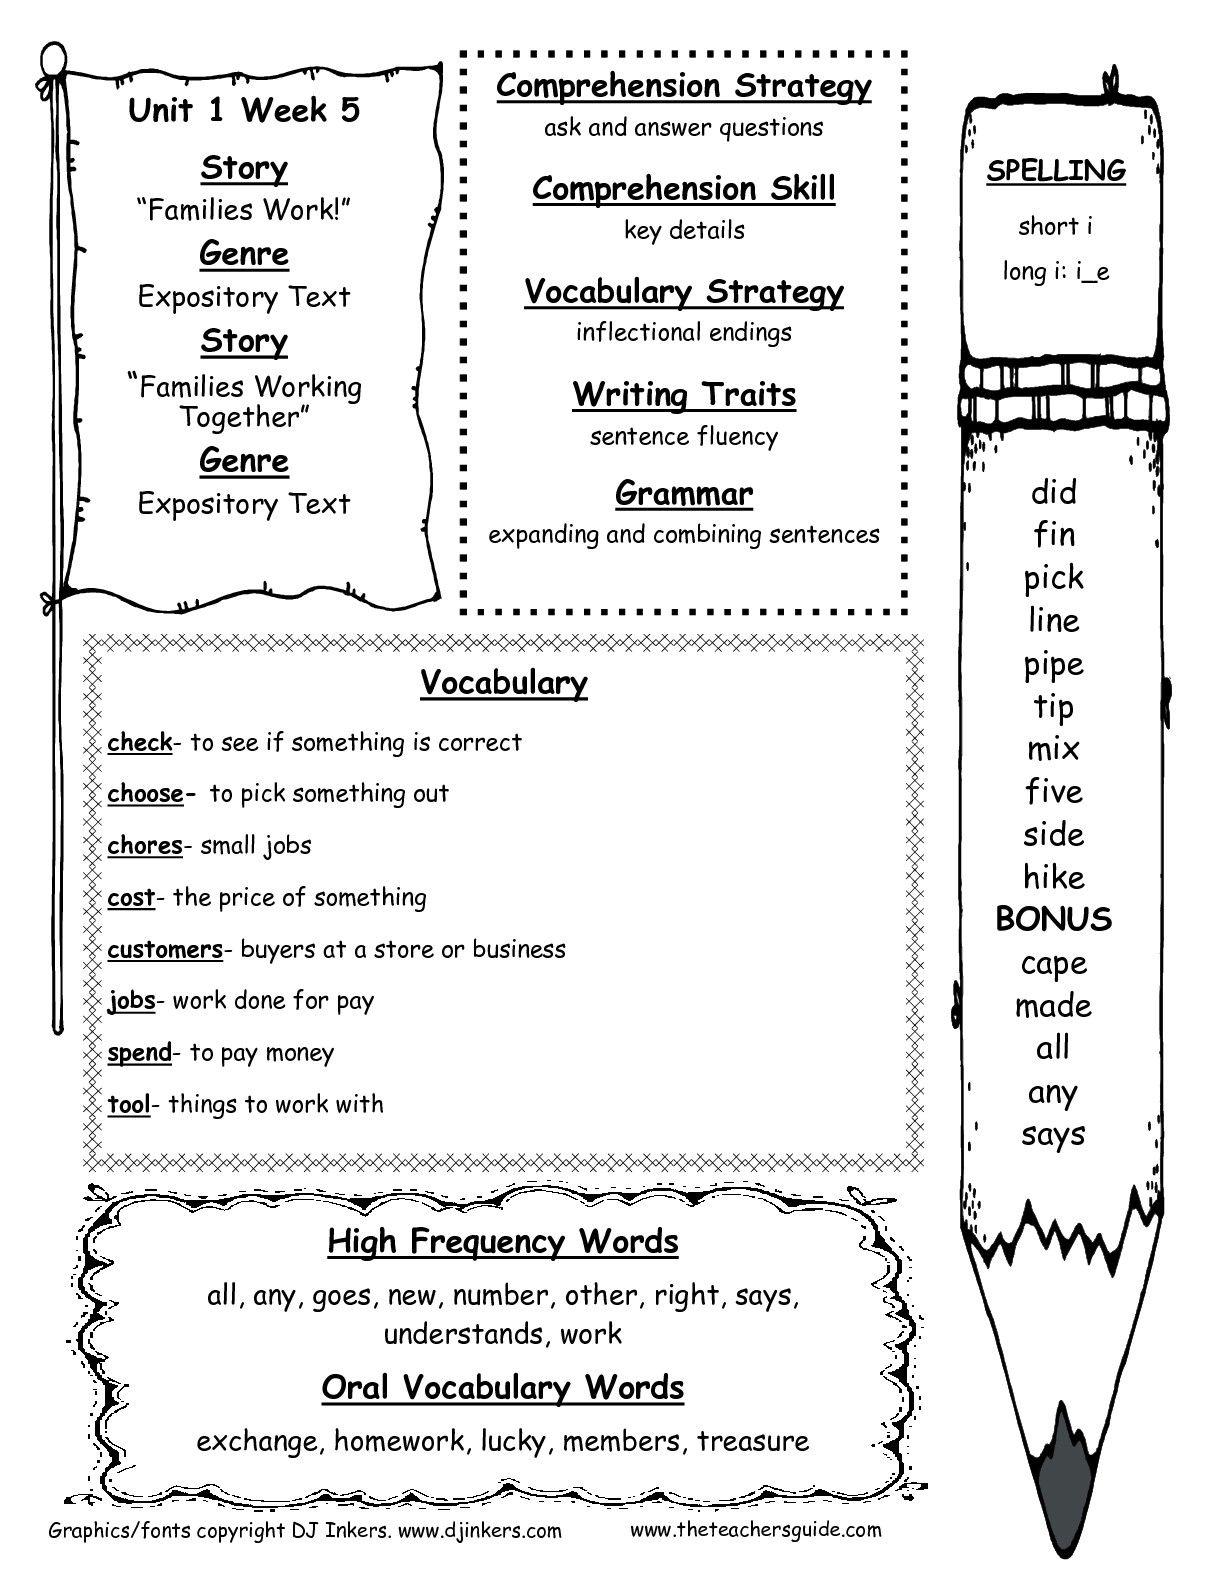 Fair Test Worksheet   Printable Worksheets and Activities for Teachers [ 1584 x 1224 Pixel ]